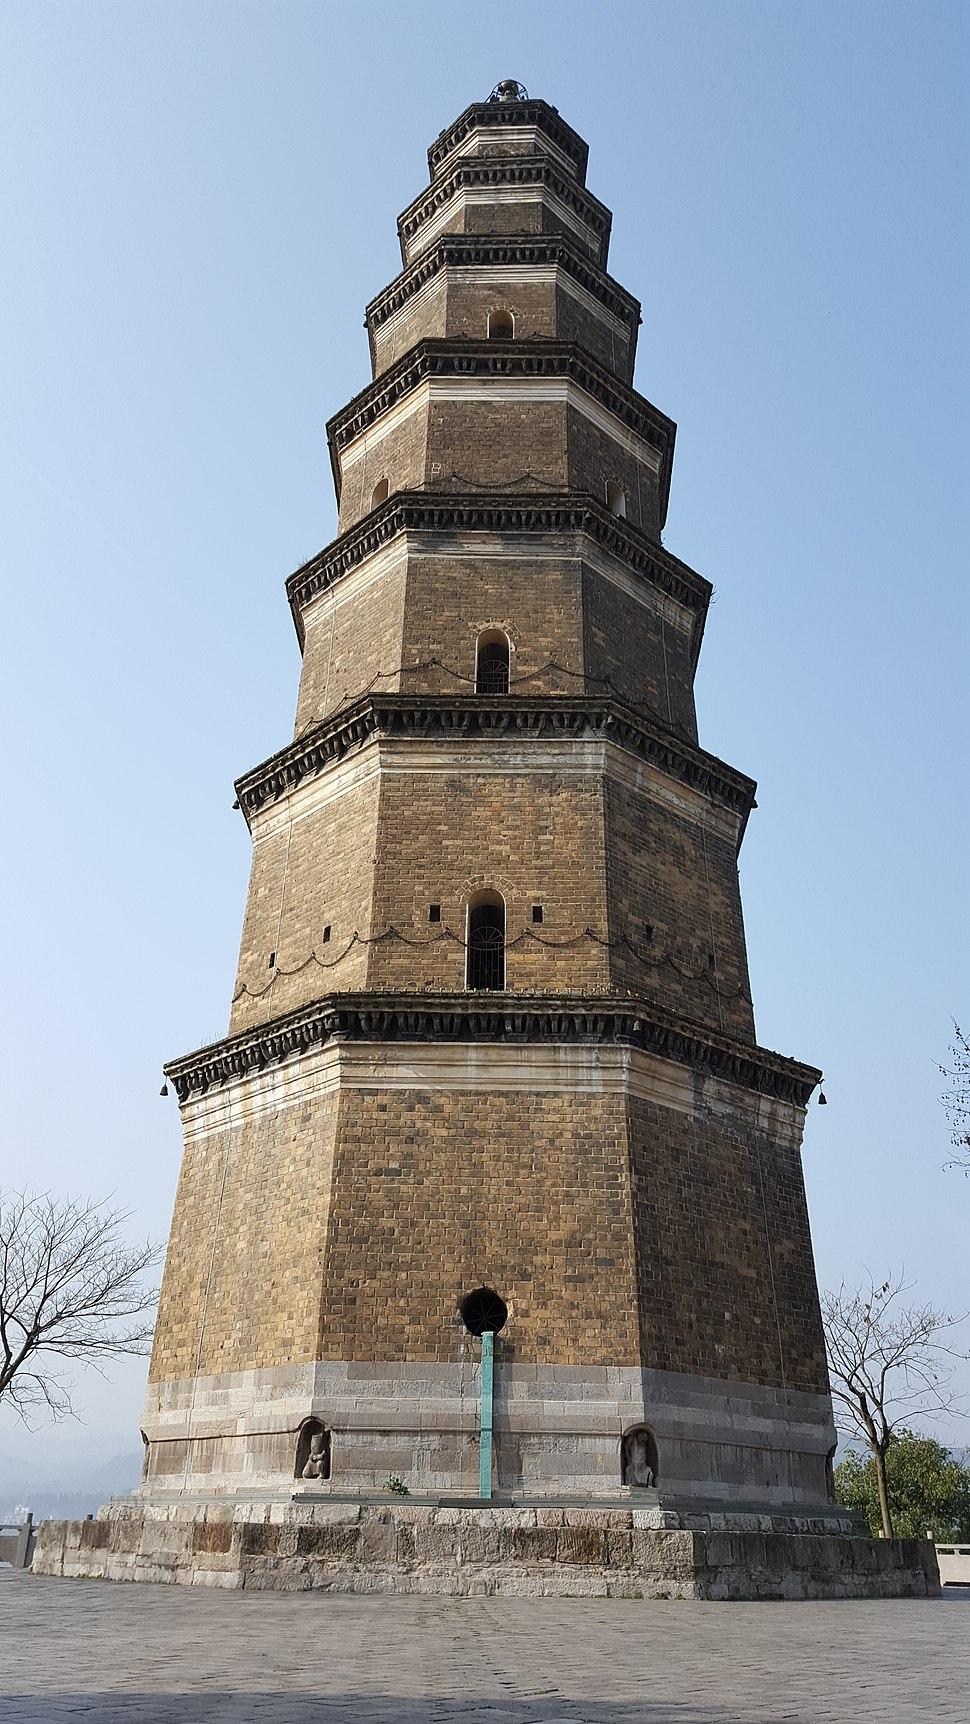 Tianran Pagoda